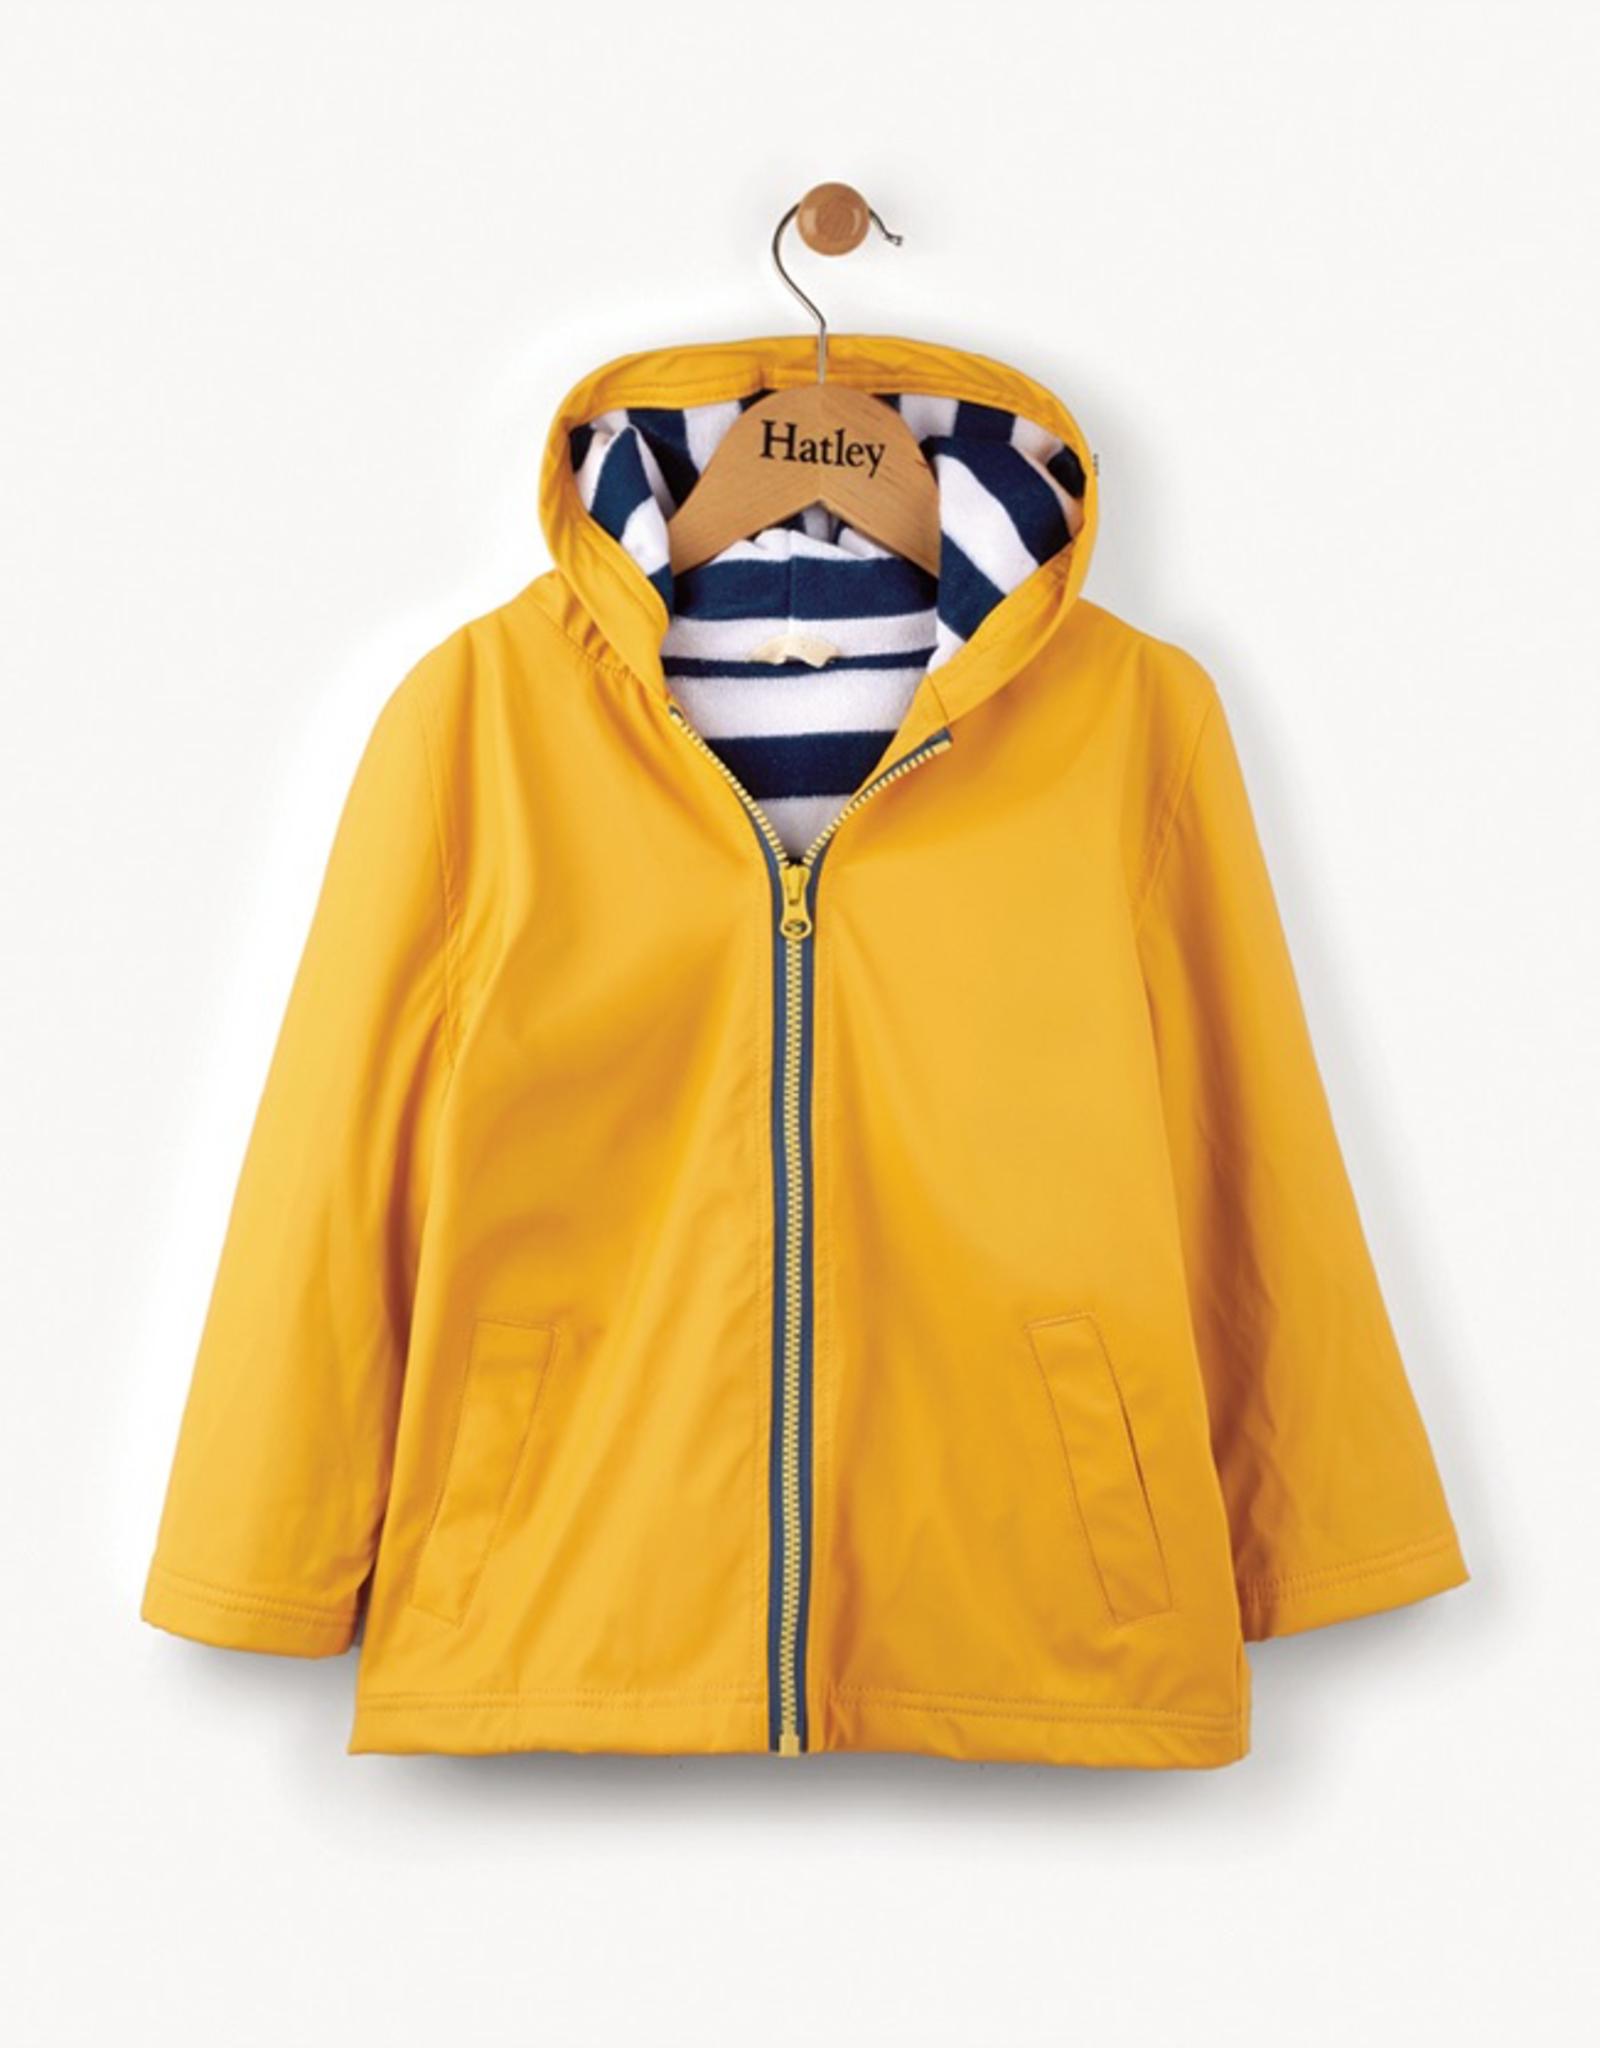 Hatley Yellow & Navy Splash Jacket for Boy